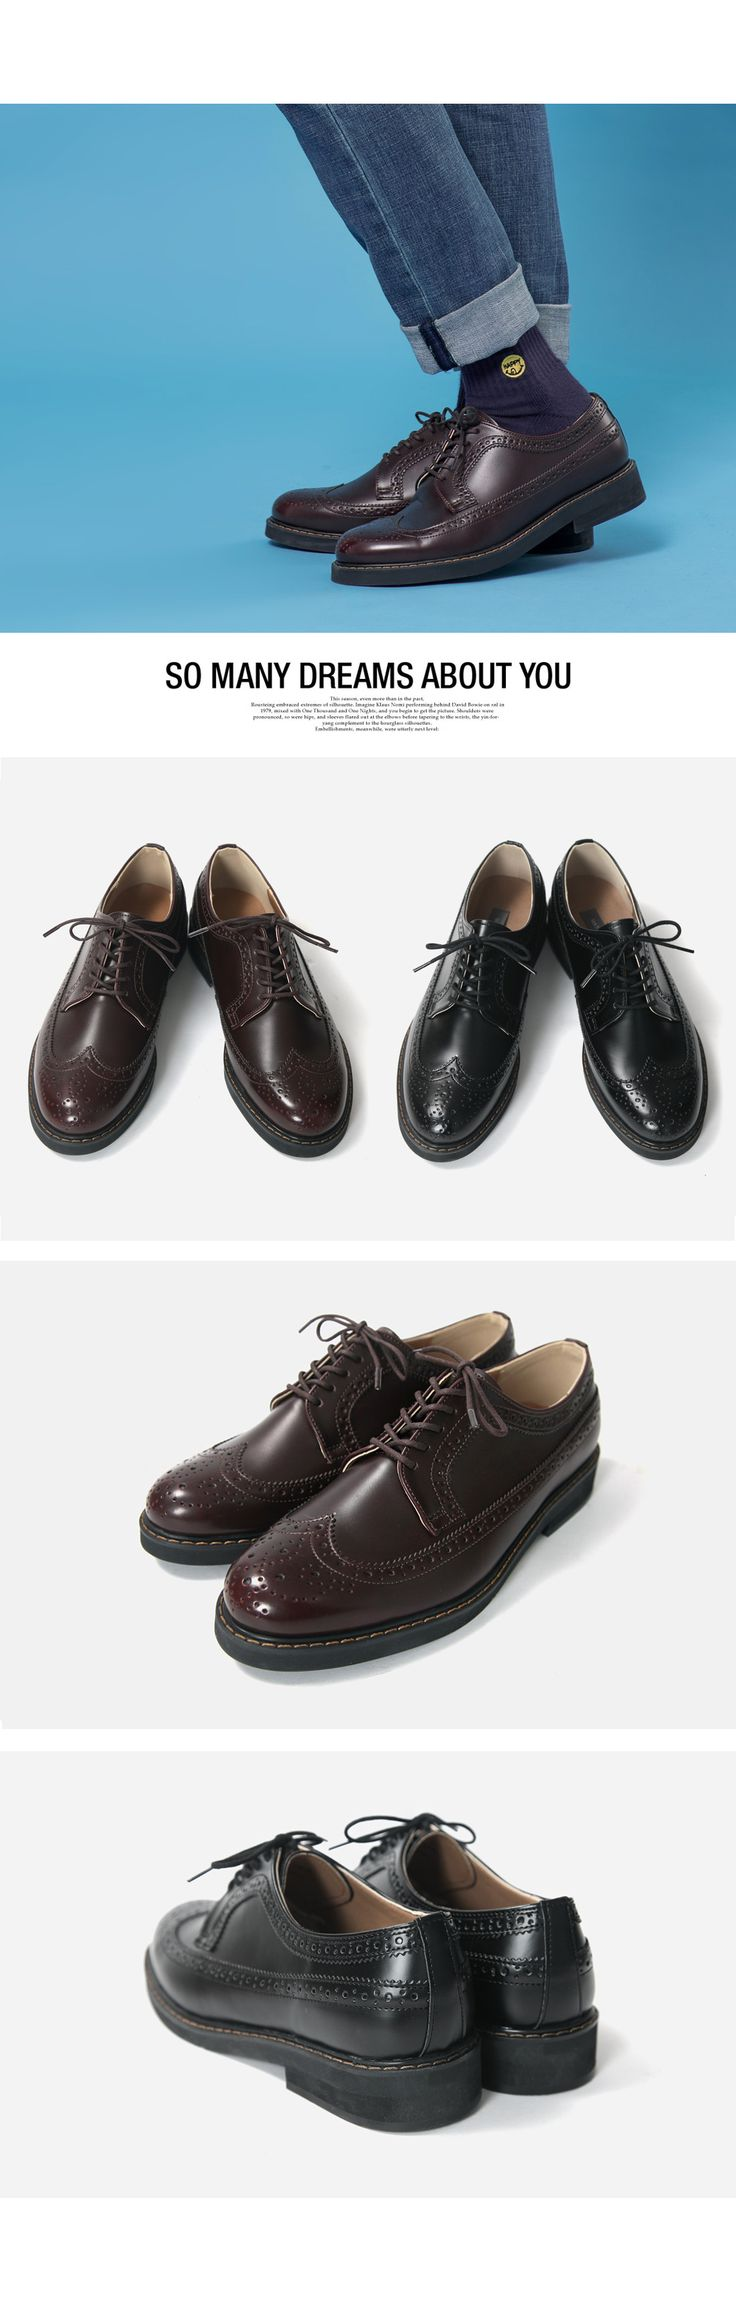 [[MN][Shoes784] 루티크 윙팁 로퍼 슈즈] 남성의류 남자의류 남자코디 남자데일리룩 데일리룩 남자패션 남자옷 남친룩 남친룩코디 윙팁 구두 남자구두 fashion daily mensfashion